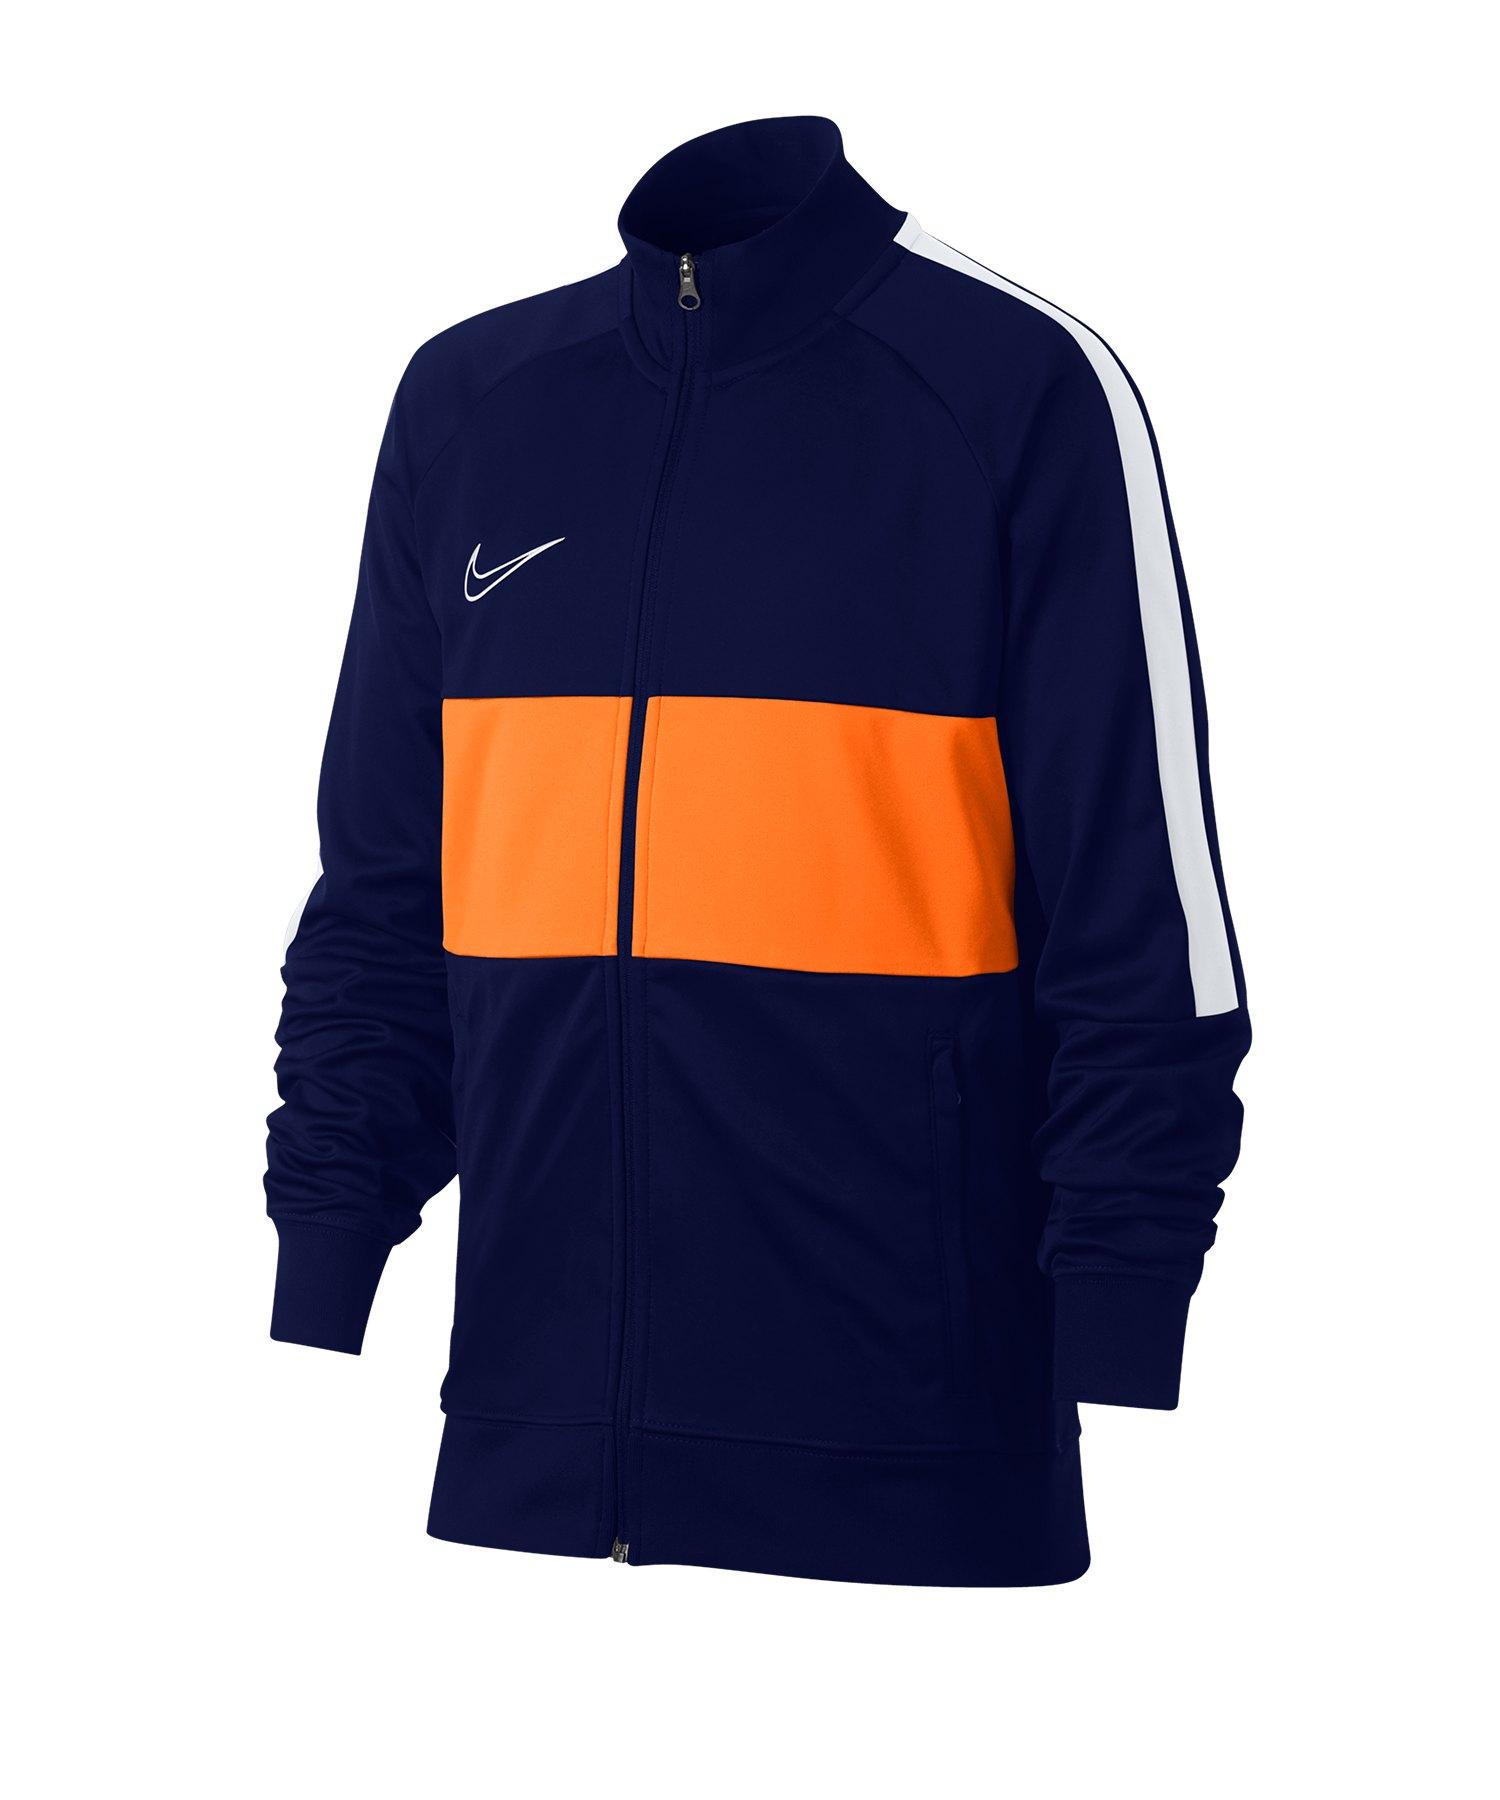 Nike Academy Dri-FIT Jacke Kids Blau Orange F492 - Blau